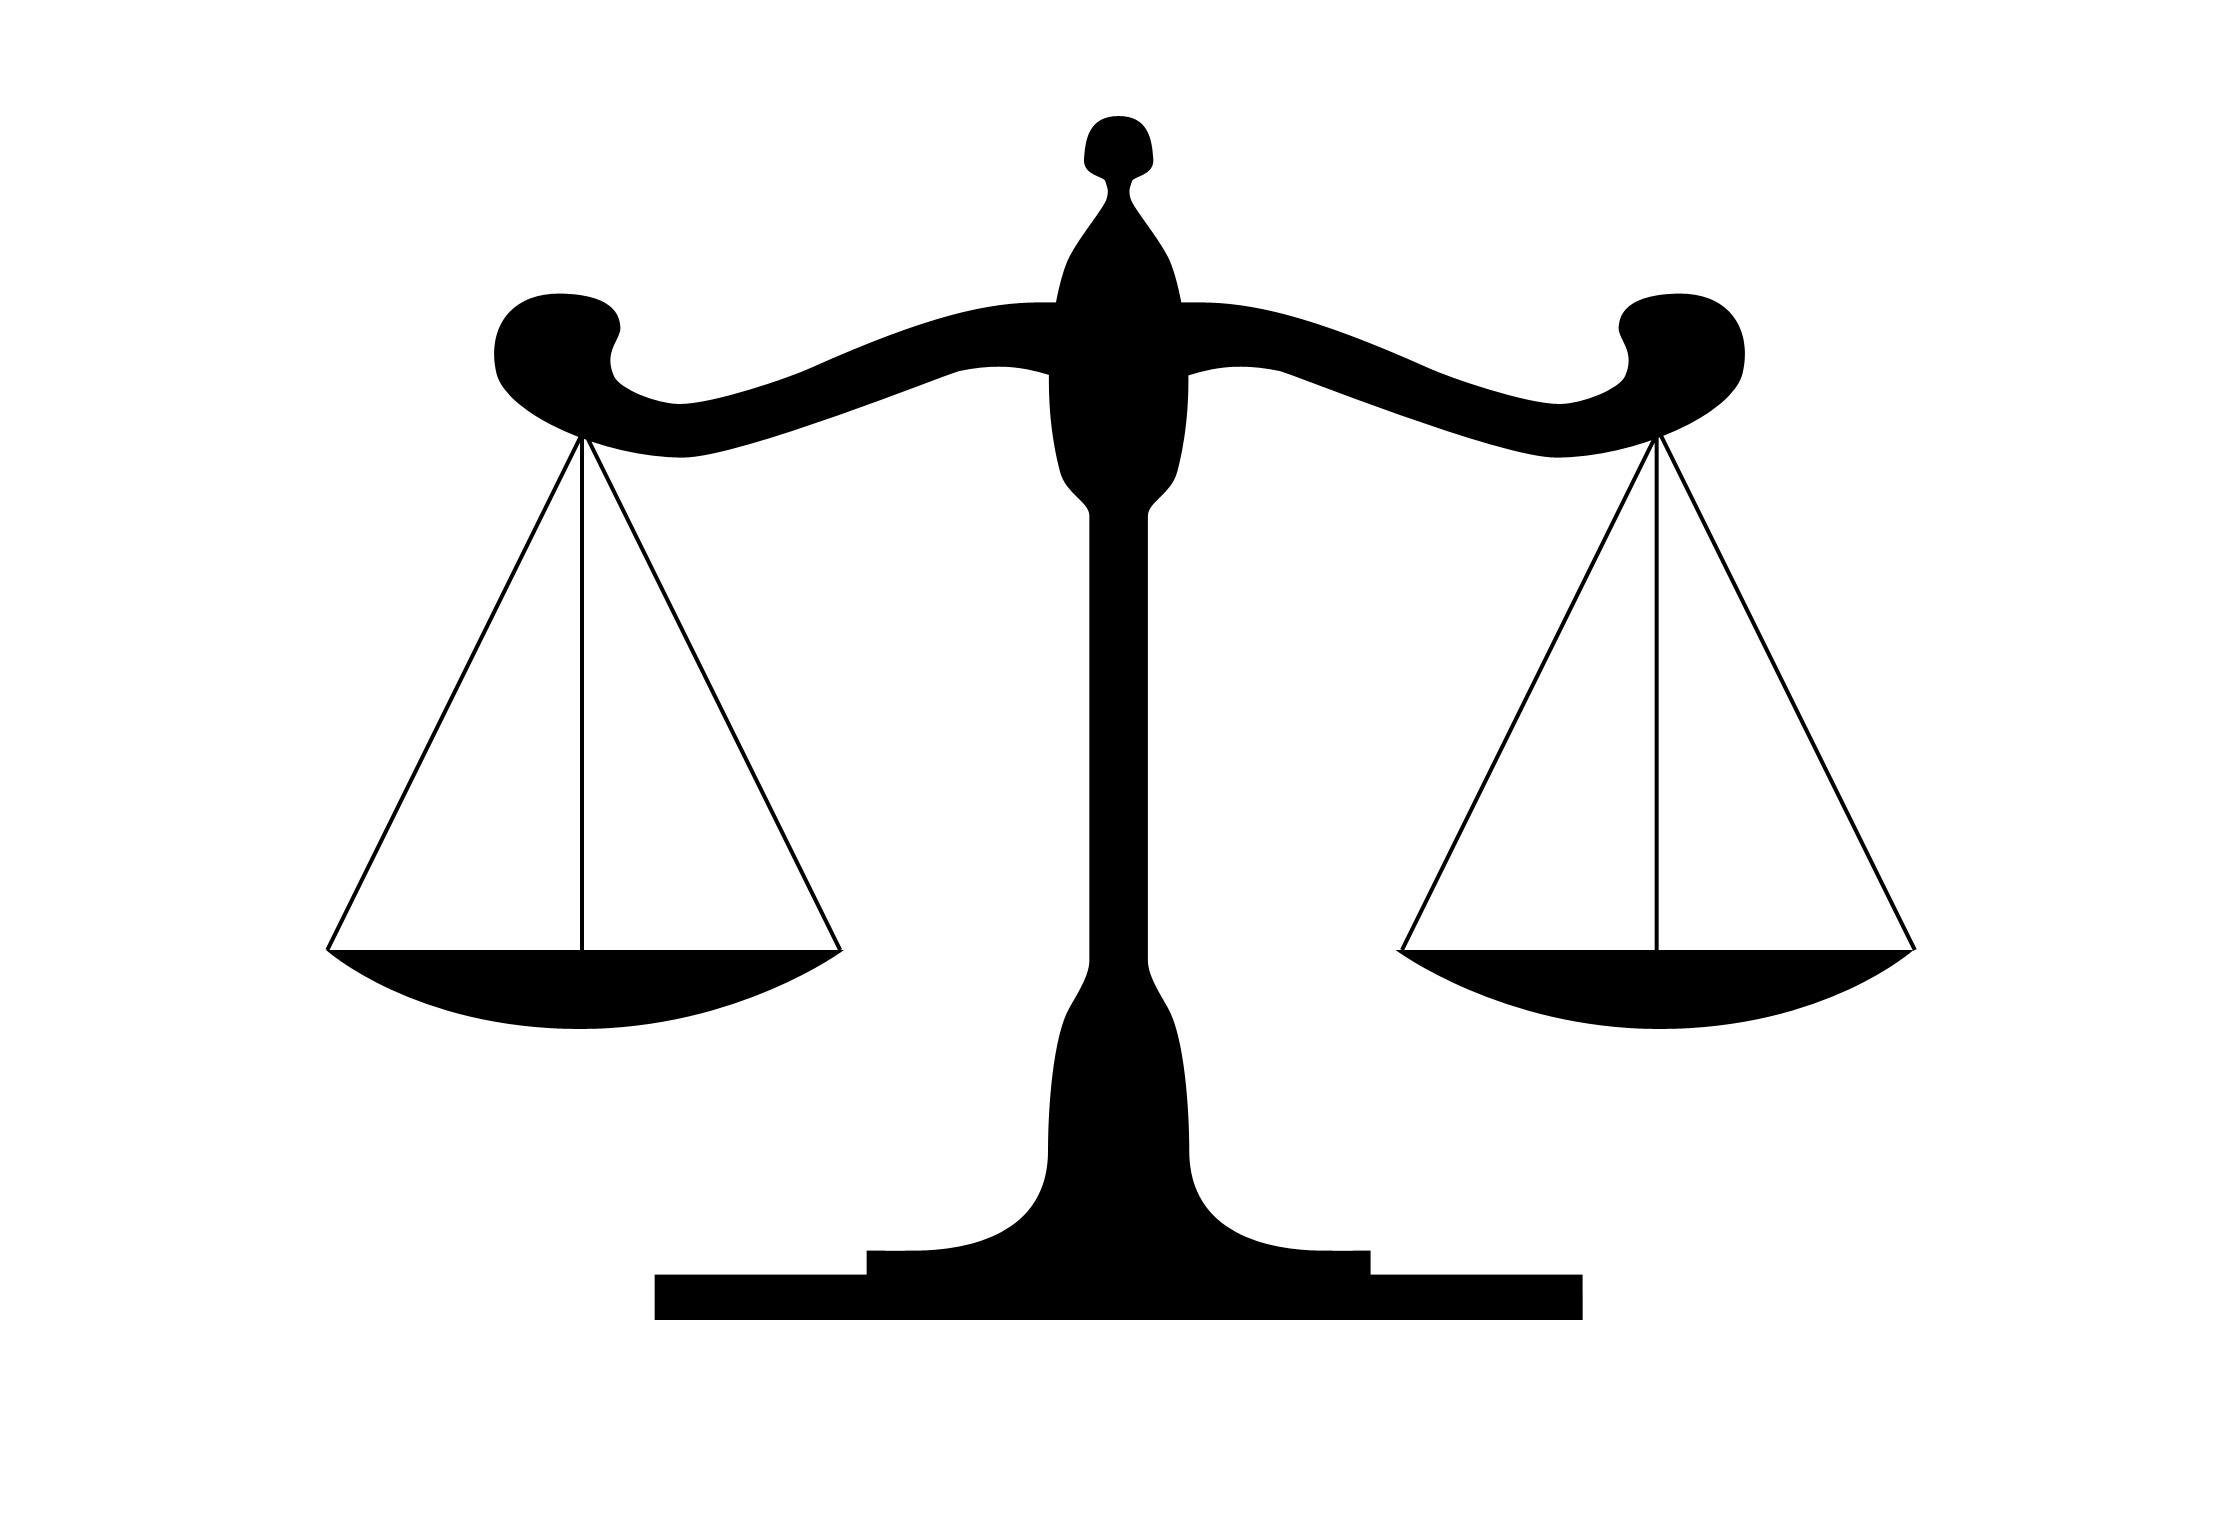 Justice Scale Clip Art - ClipArt Best